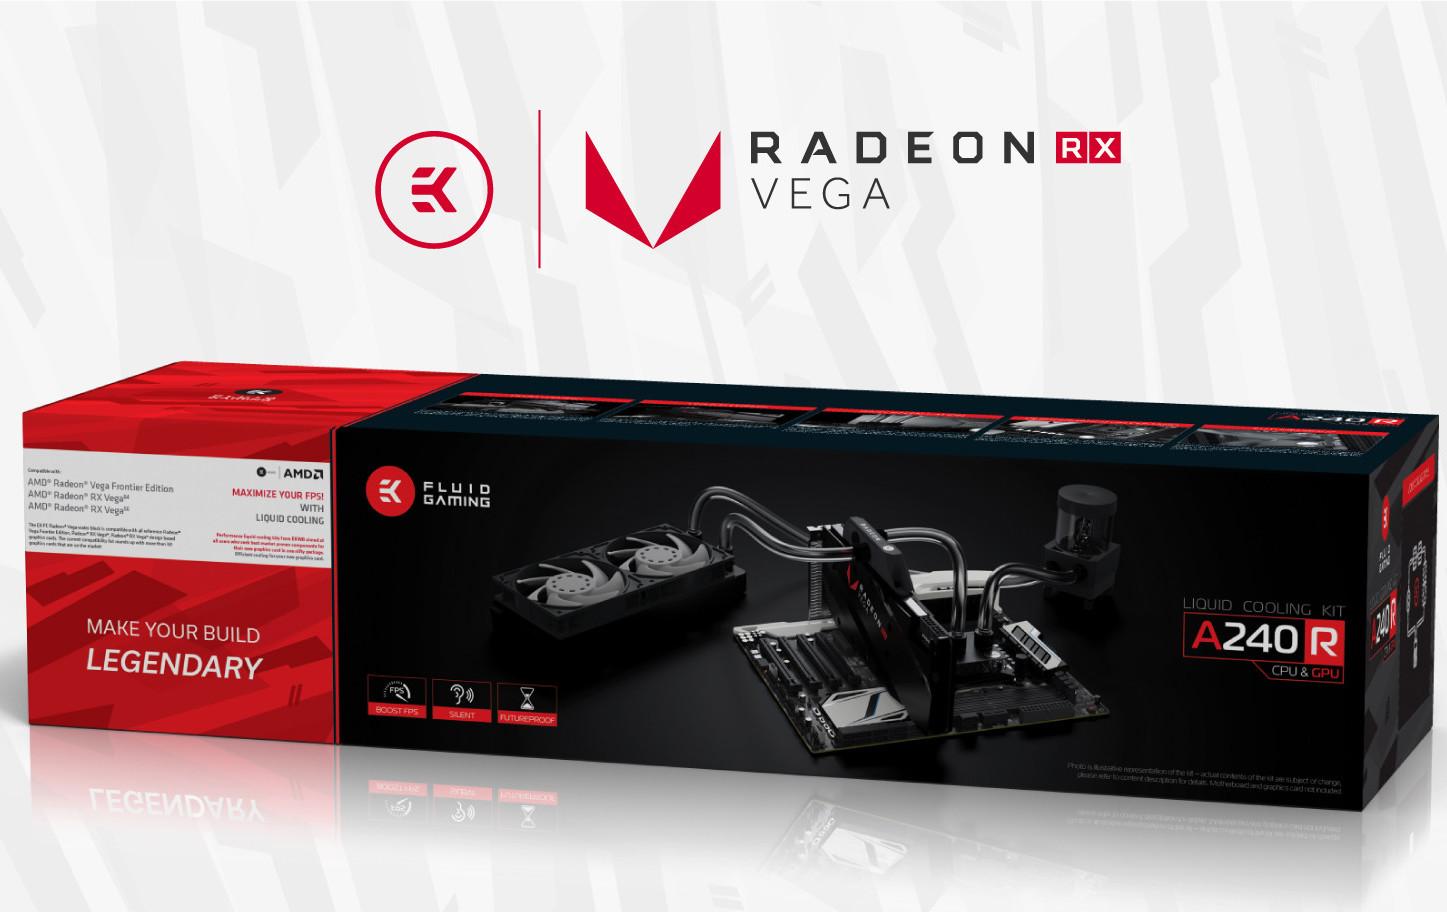 EK Water Blocks Announces Fluid Gaming A240R Kit | TechPowerUp